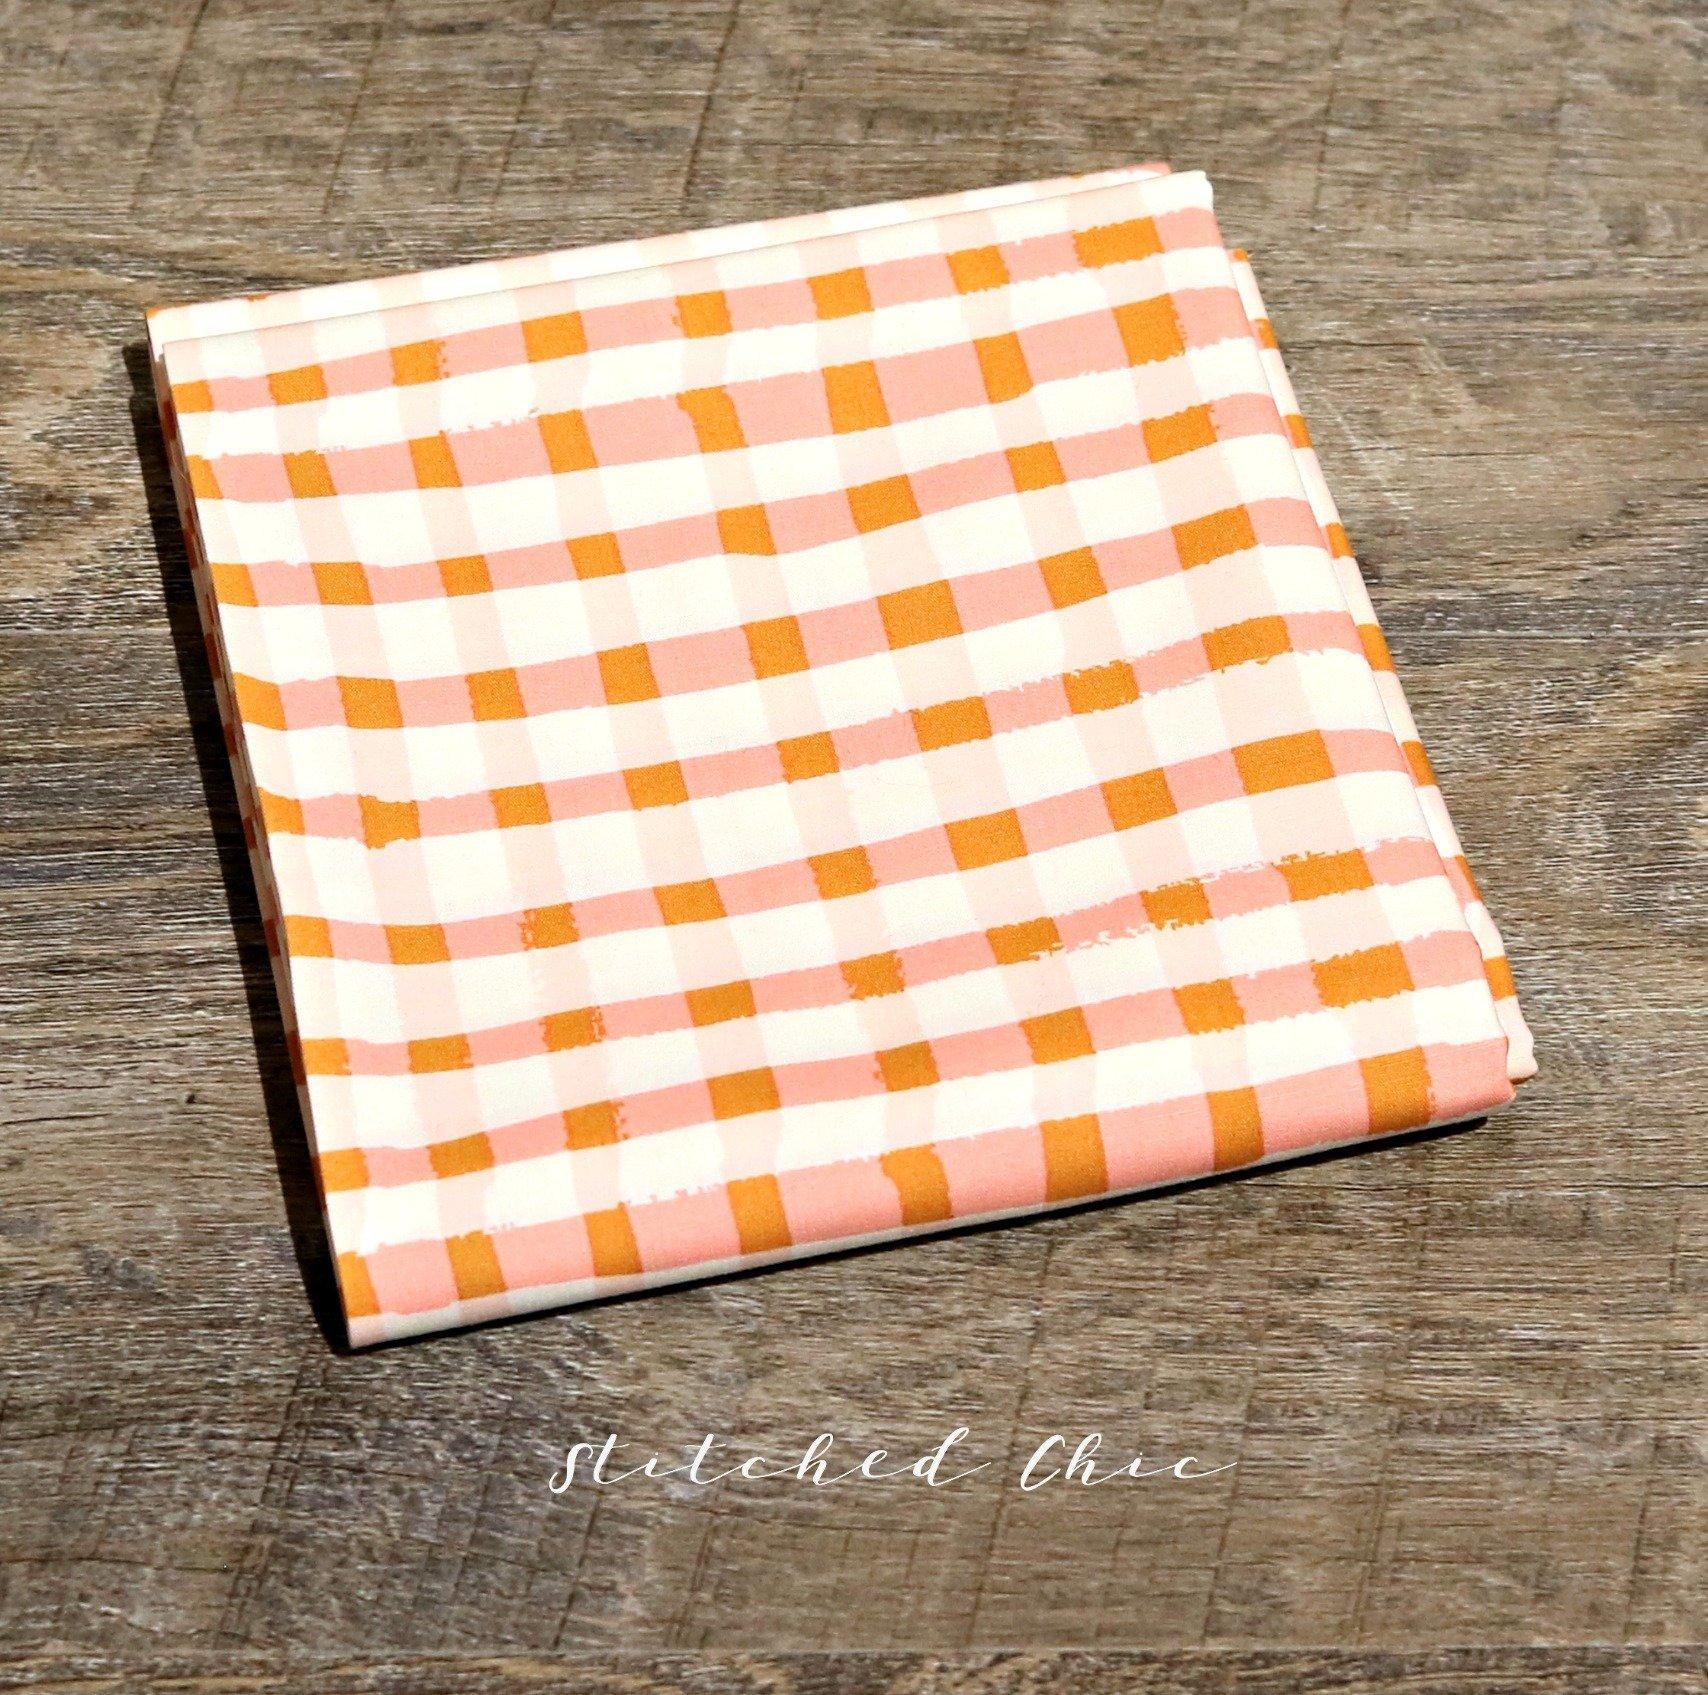 Art Gallery Fabric Lambkin in Wooly Blush by Bonnie Christine | 1/2 Yard |  Modern Cotton Fabric